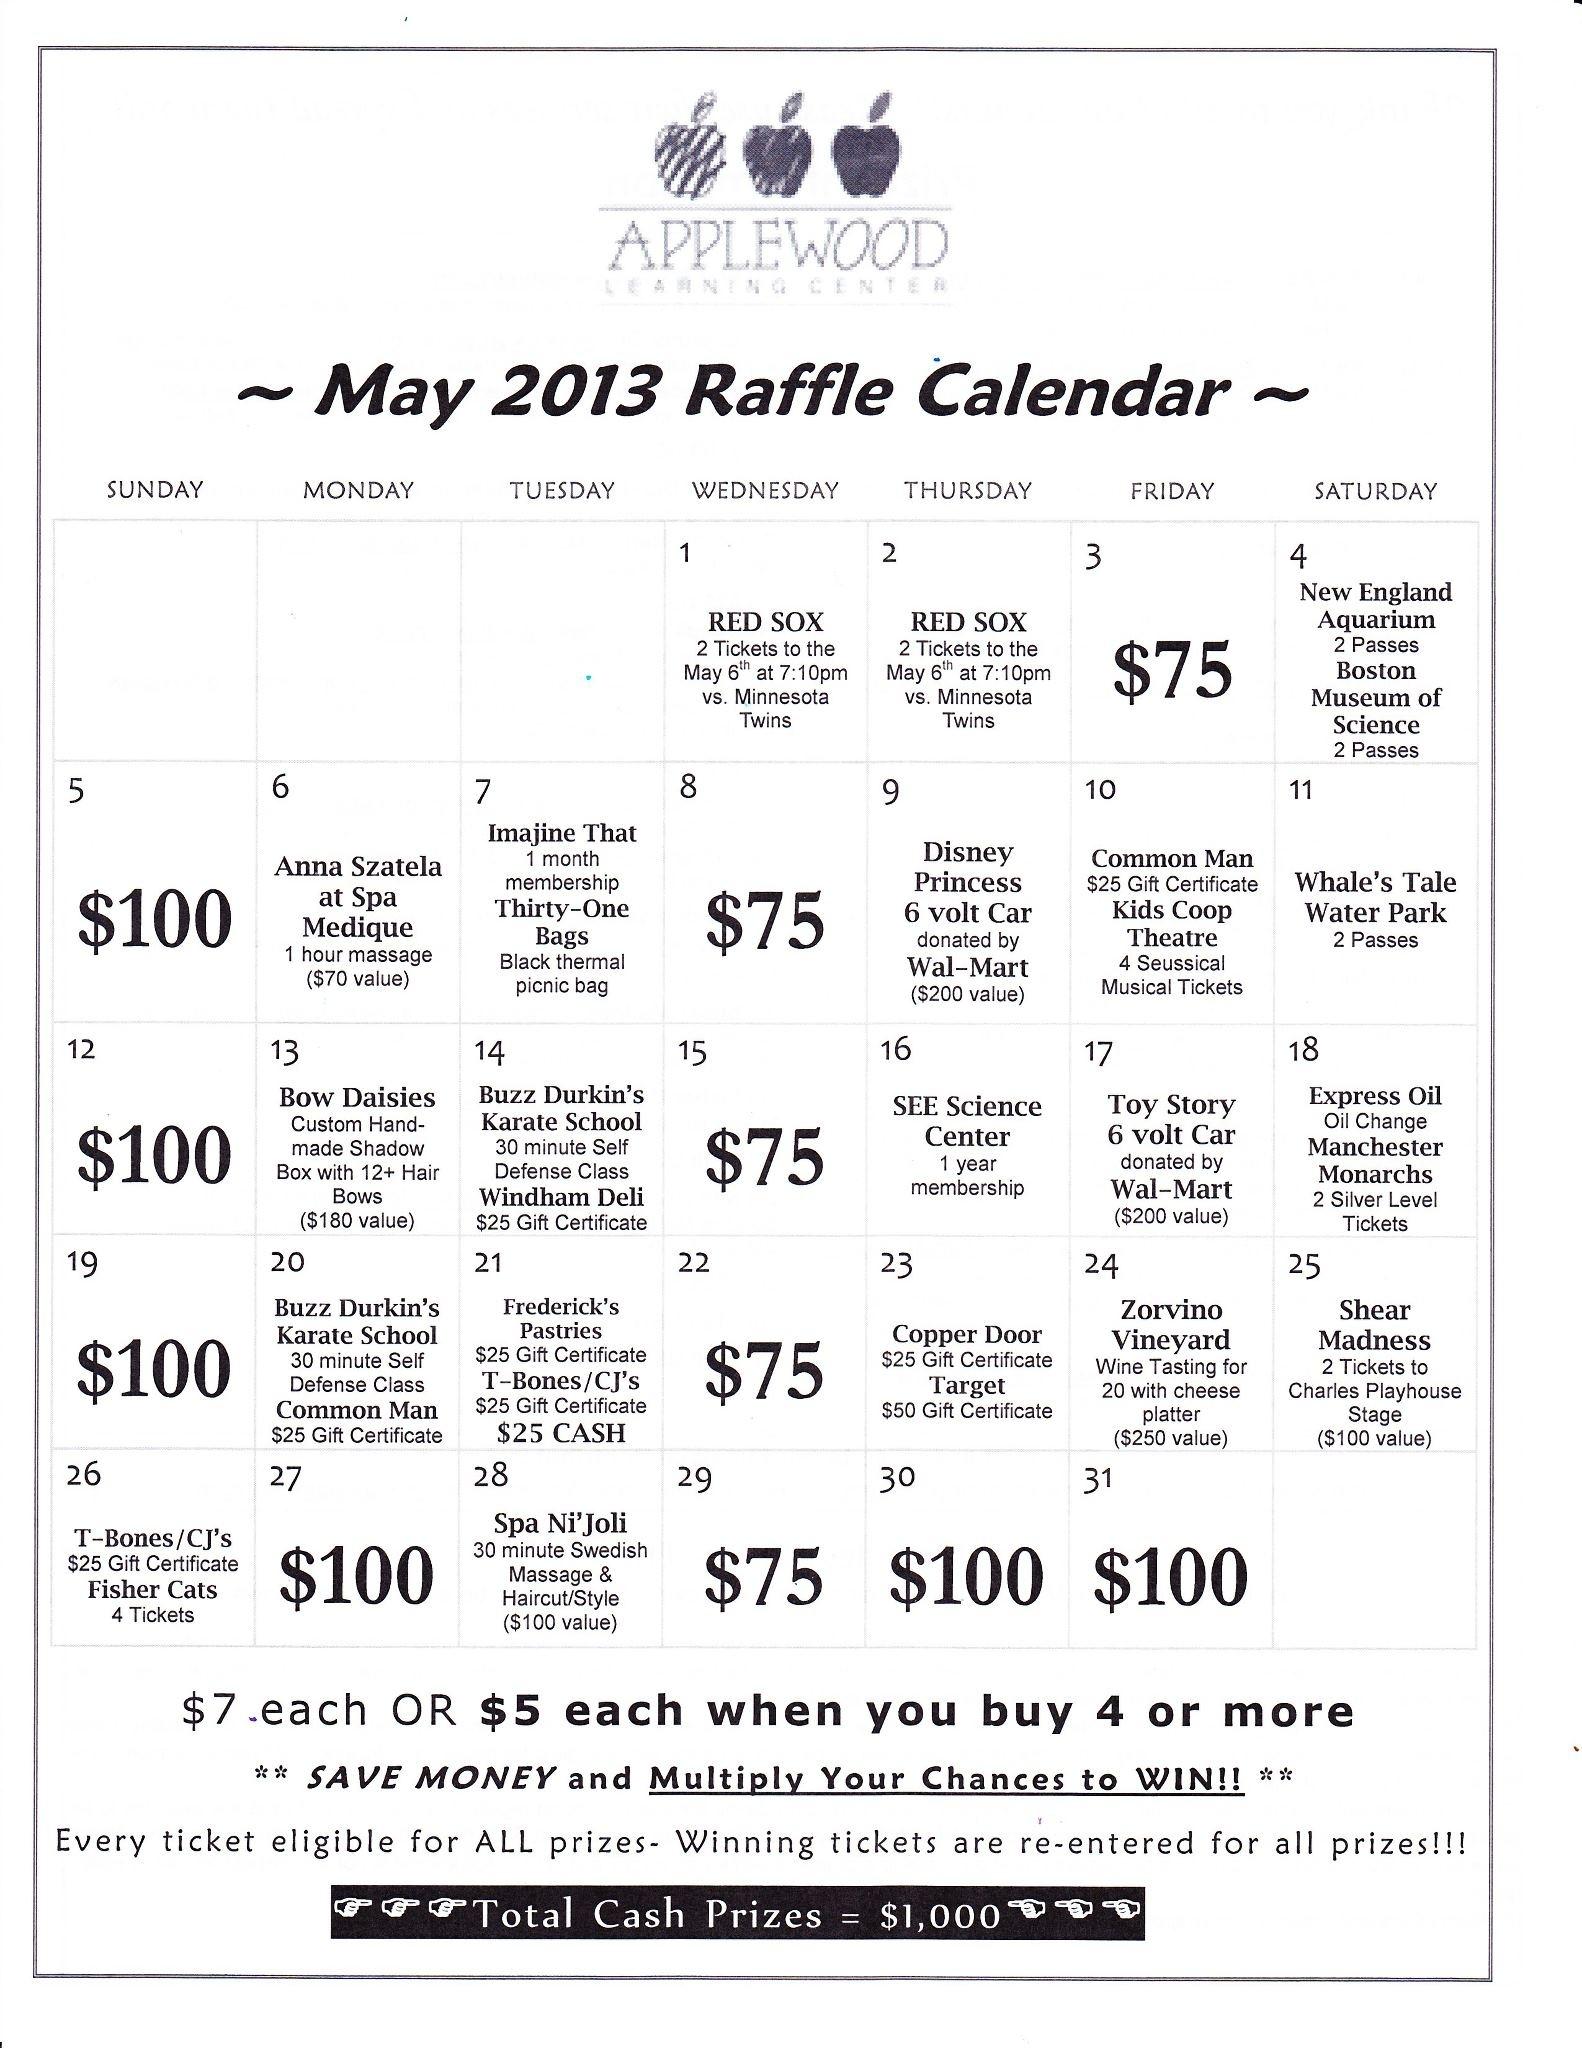 Annual Raffle Calendar Fundraiser | Applewood Learning Center Cash Calendar Raffle Template